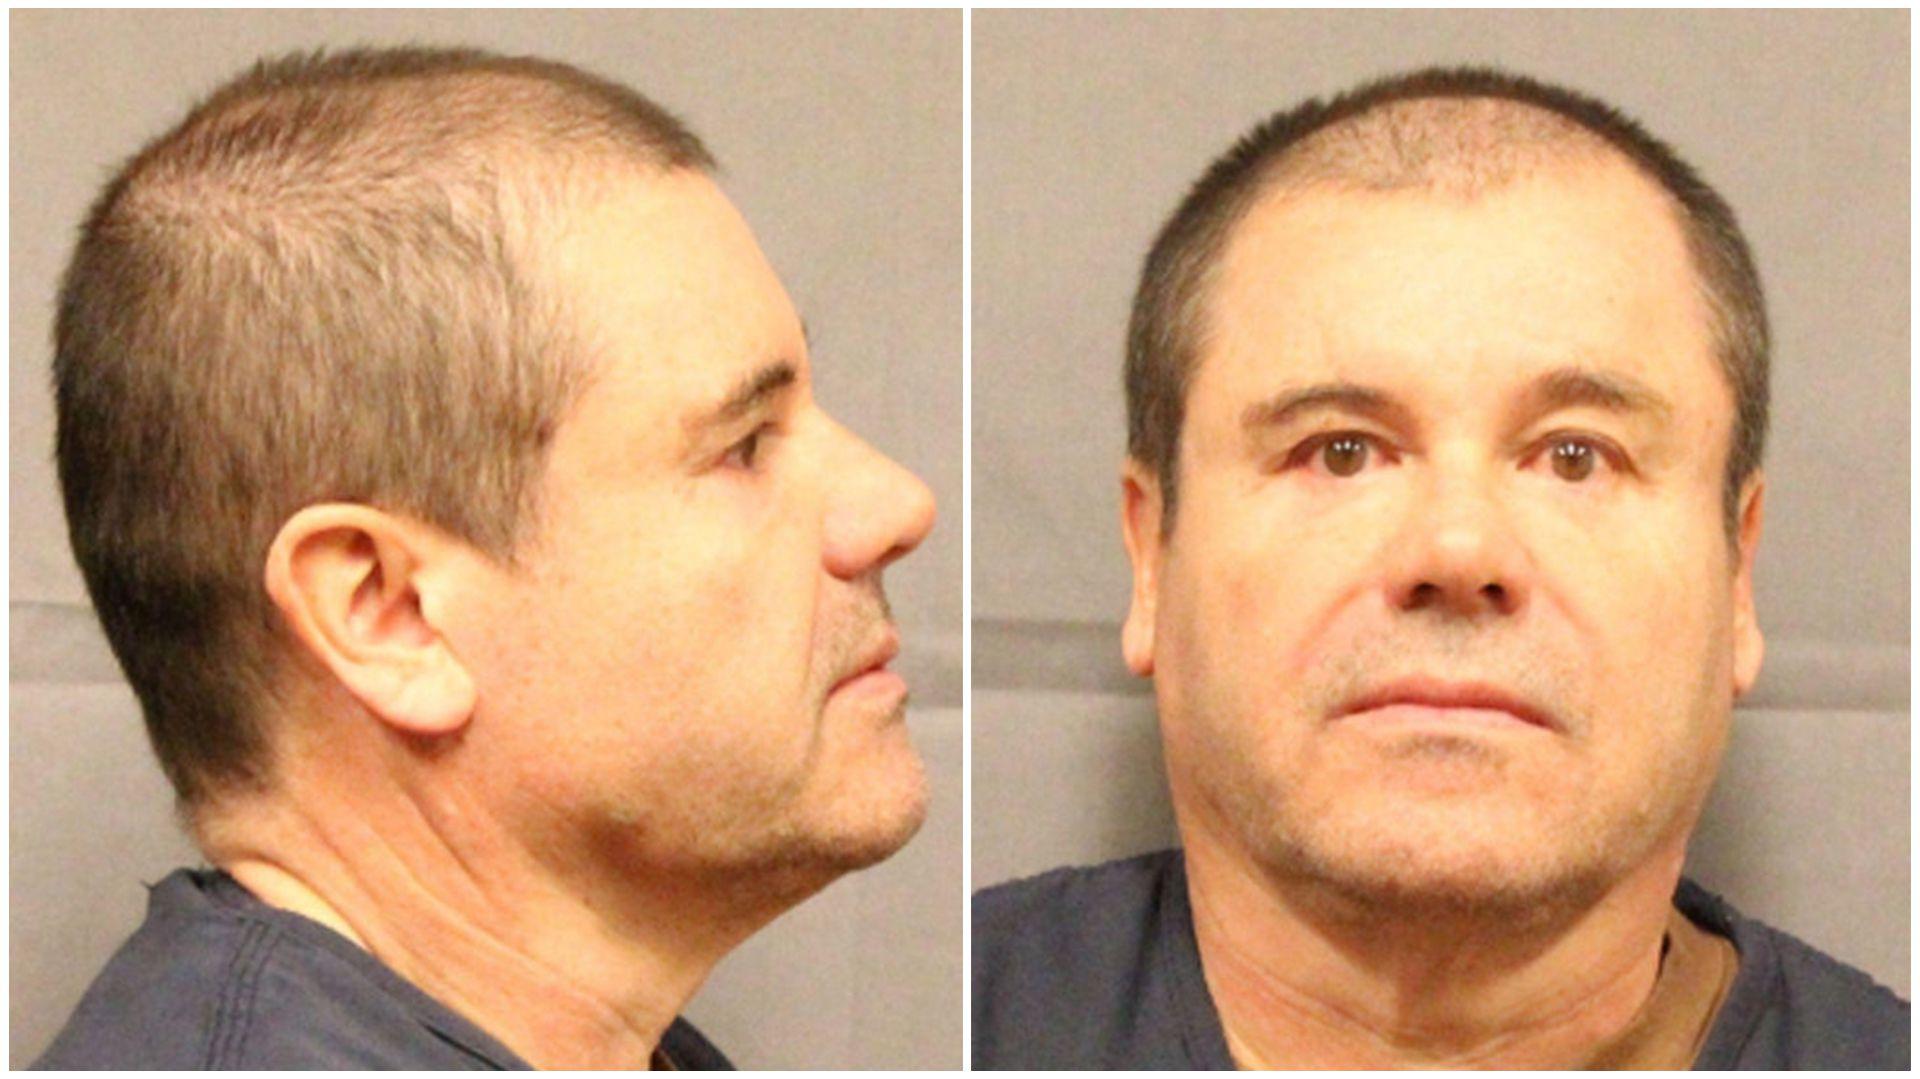 EEUU se apresta a sentenciar al Chapo Guzmán a cadena perpetua